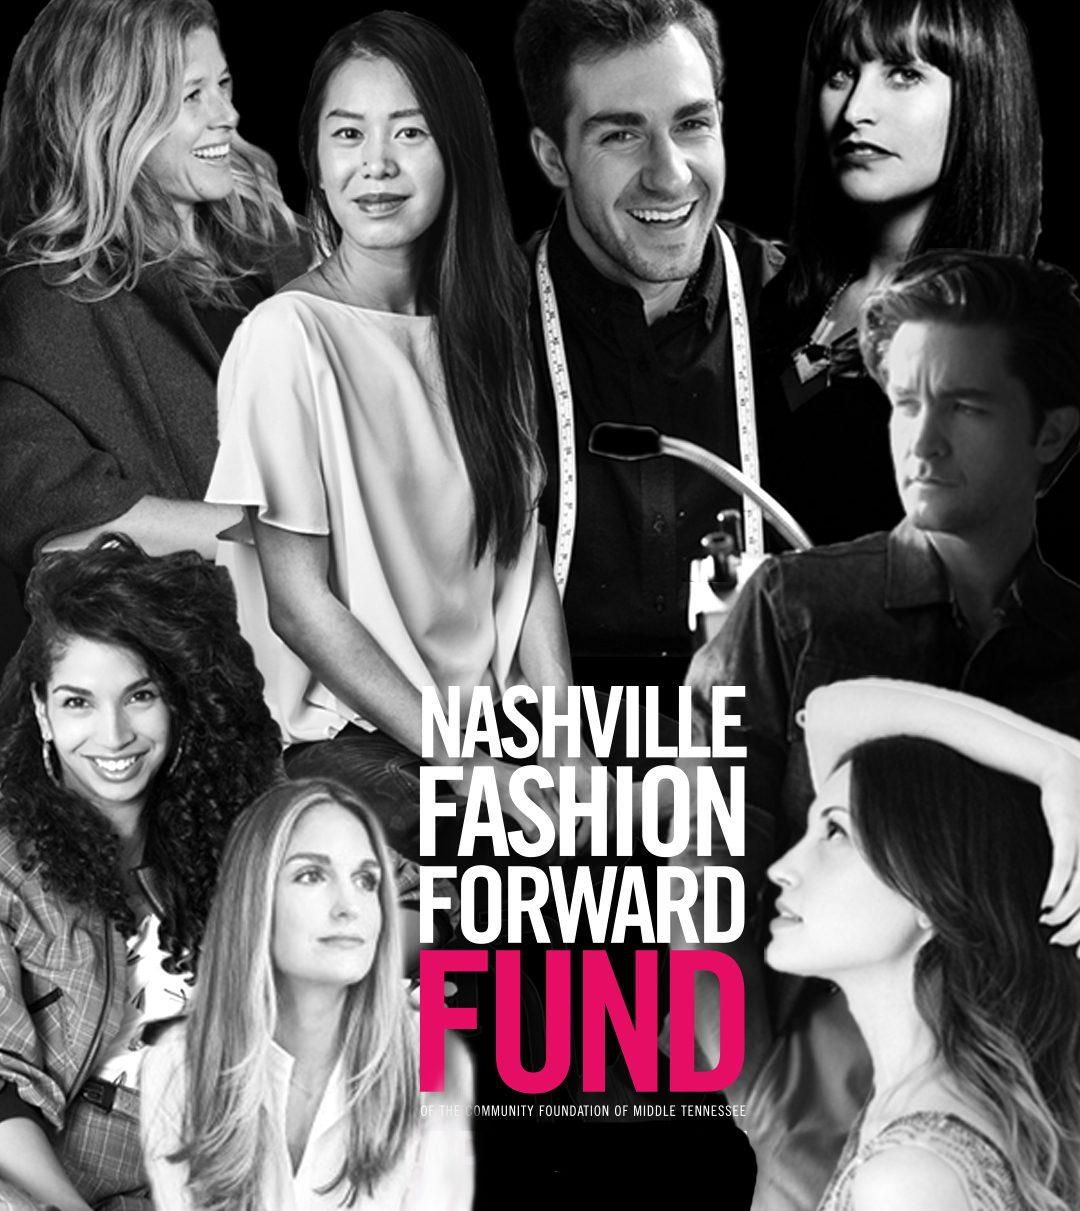 Nashville Fashion Forward Fund